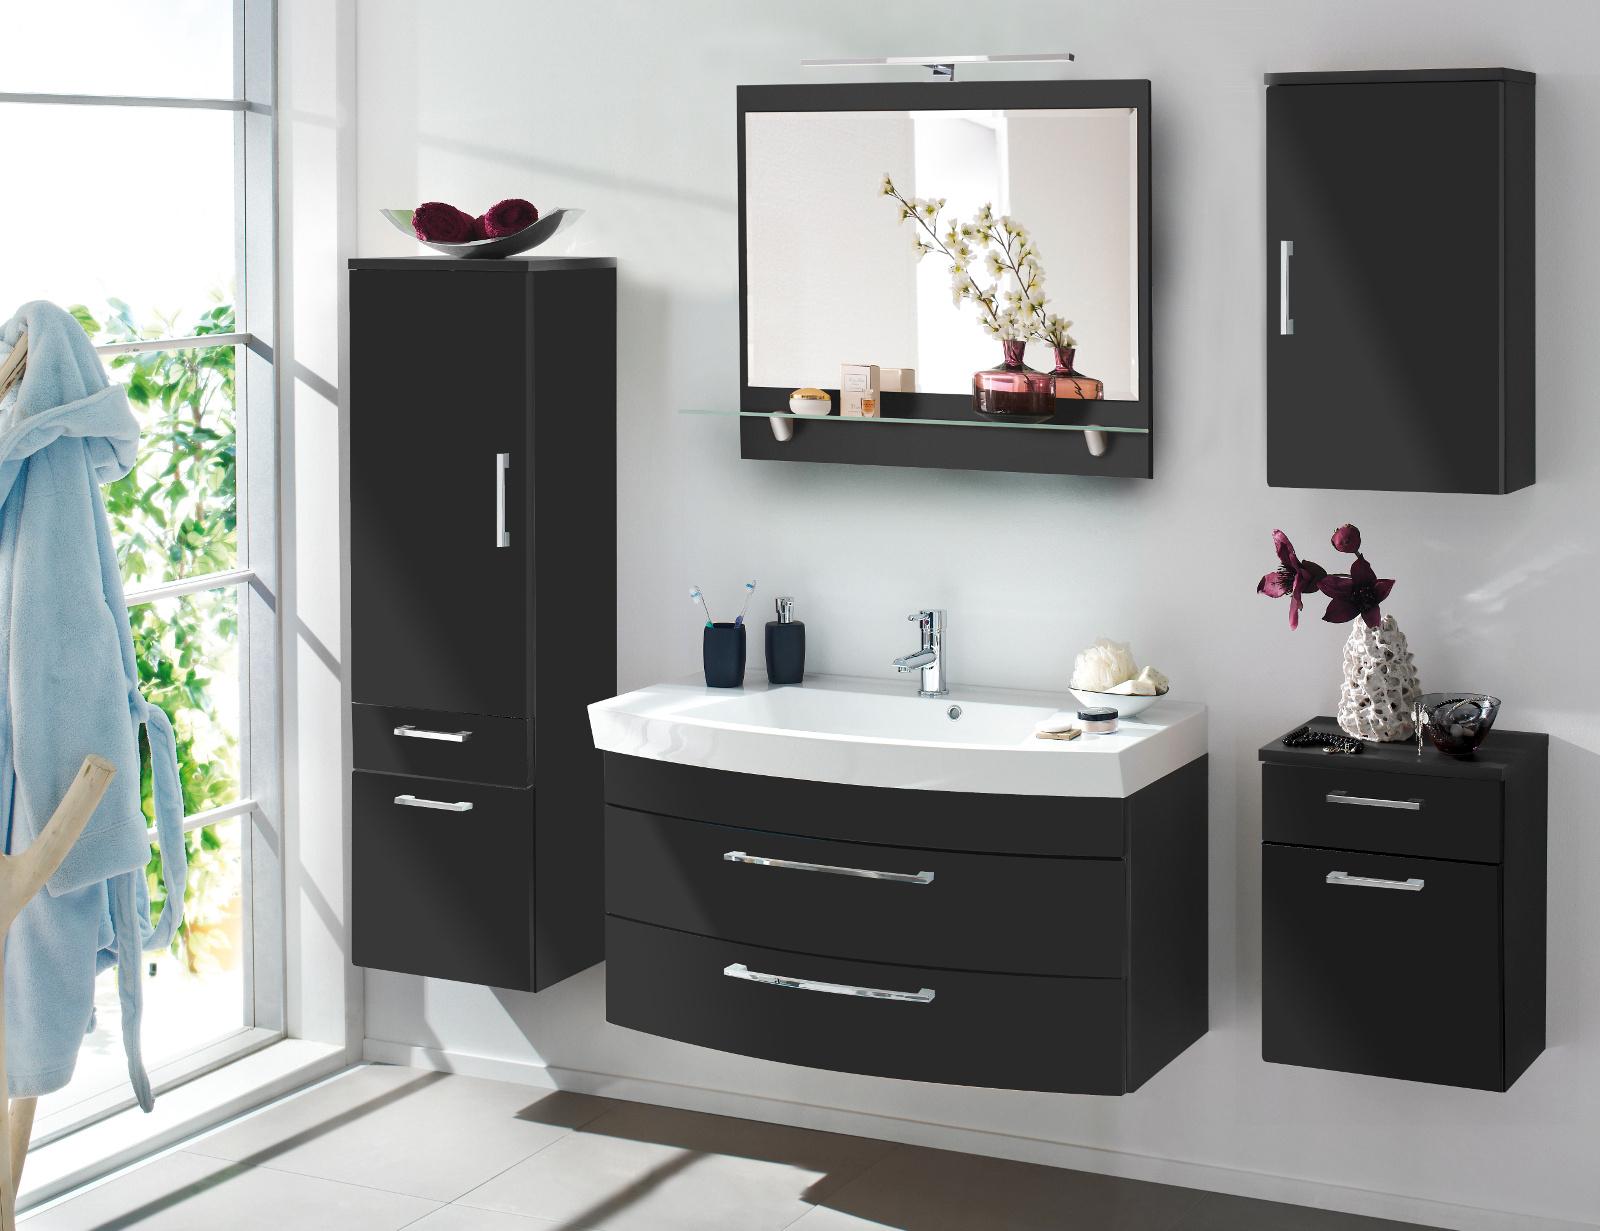 Wohnwand Anbauwand teilmassiv modern Pandaras2 - Designermöbel ...